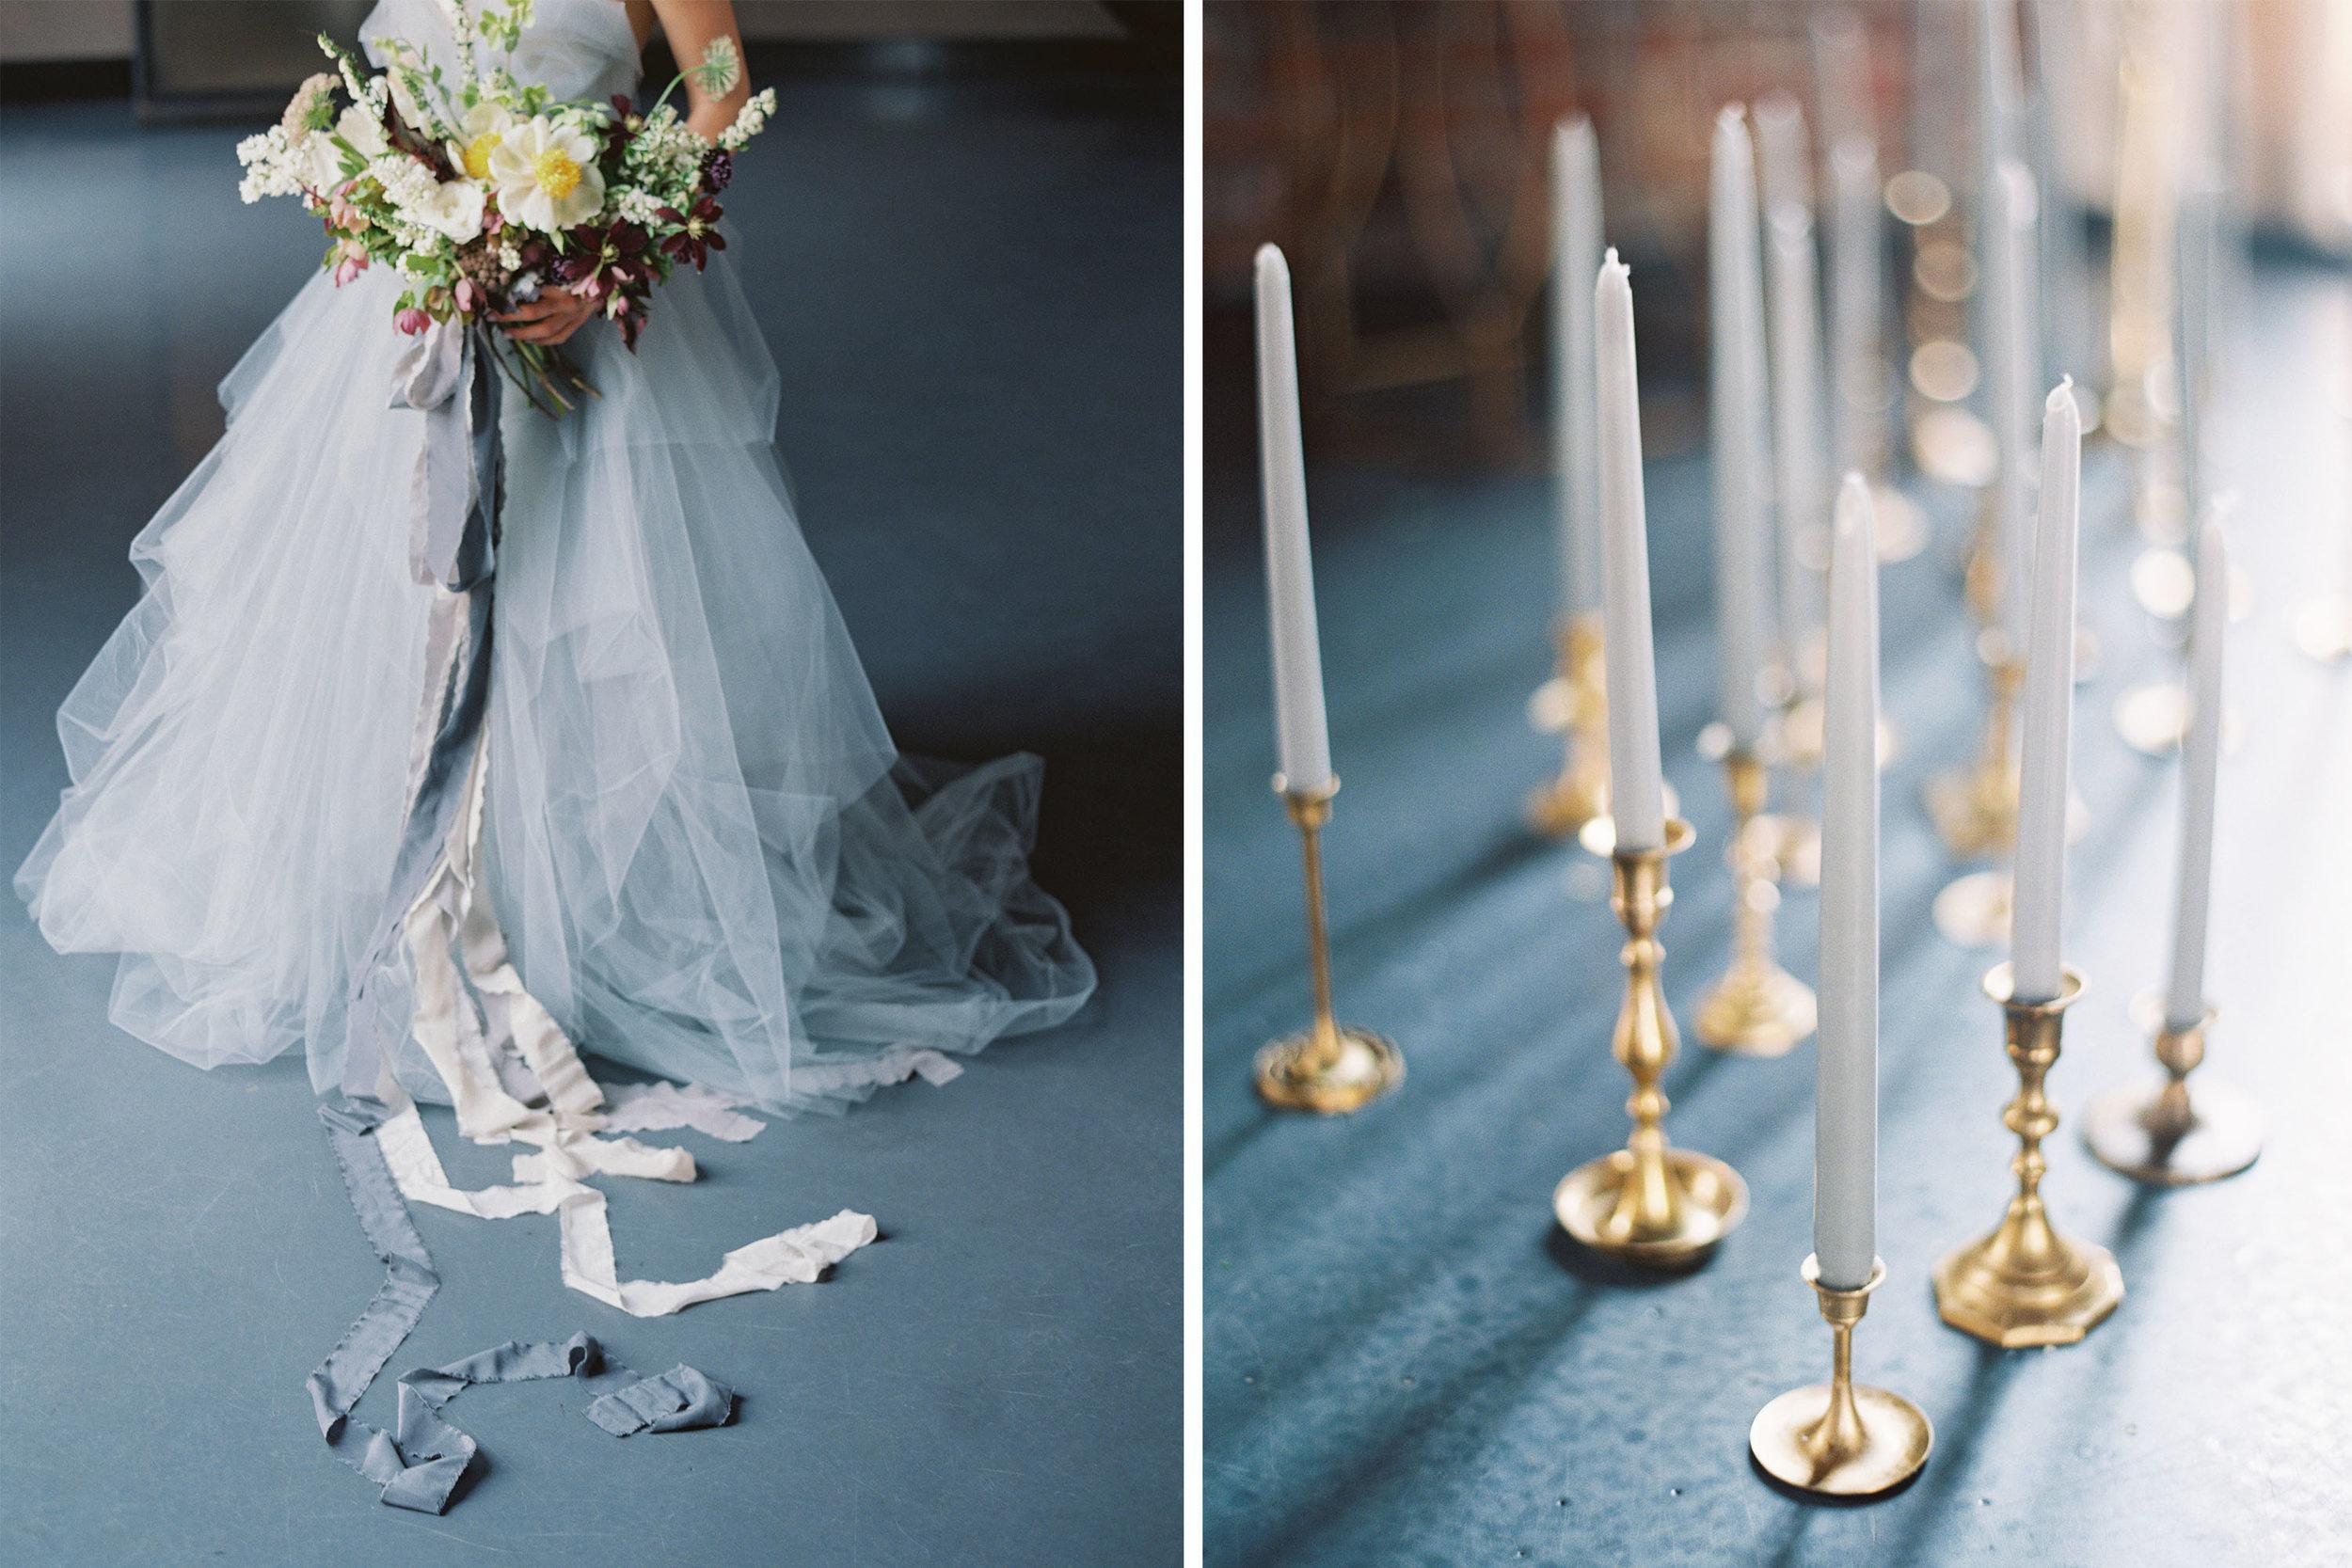 Carol Hannah Bridal Oceane Gown Pyrite Gown Multi 4.jpg